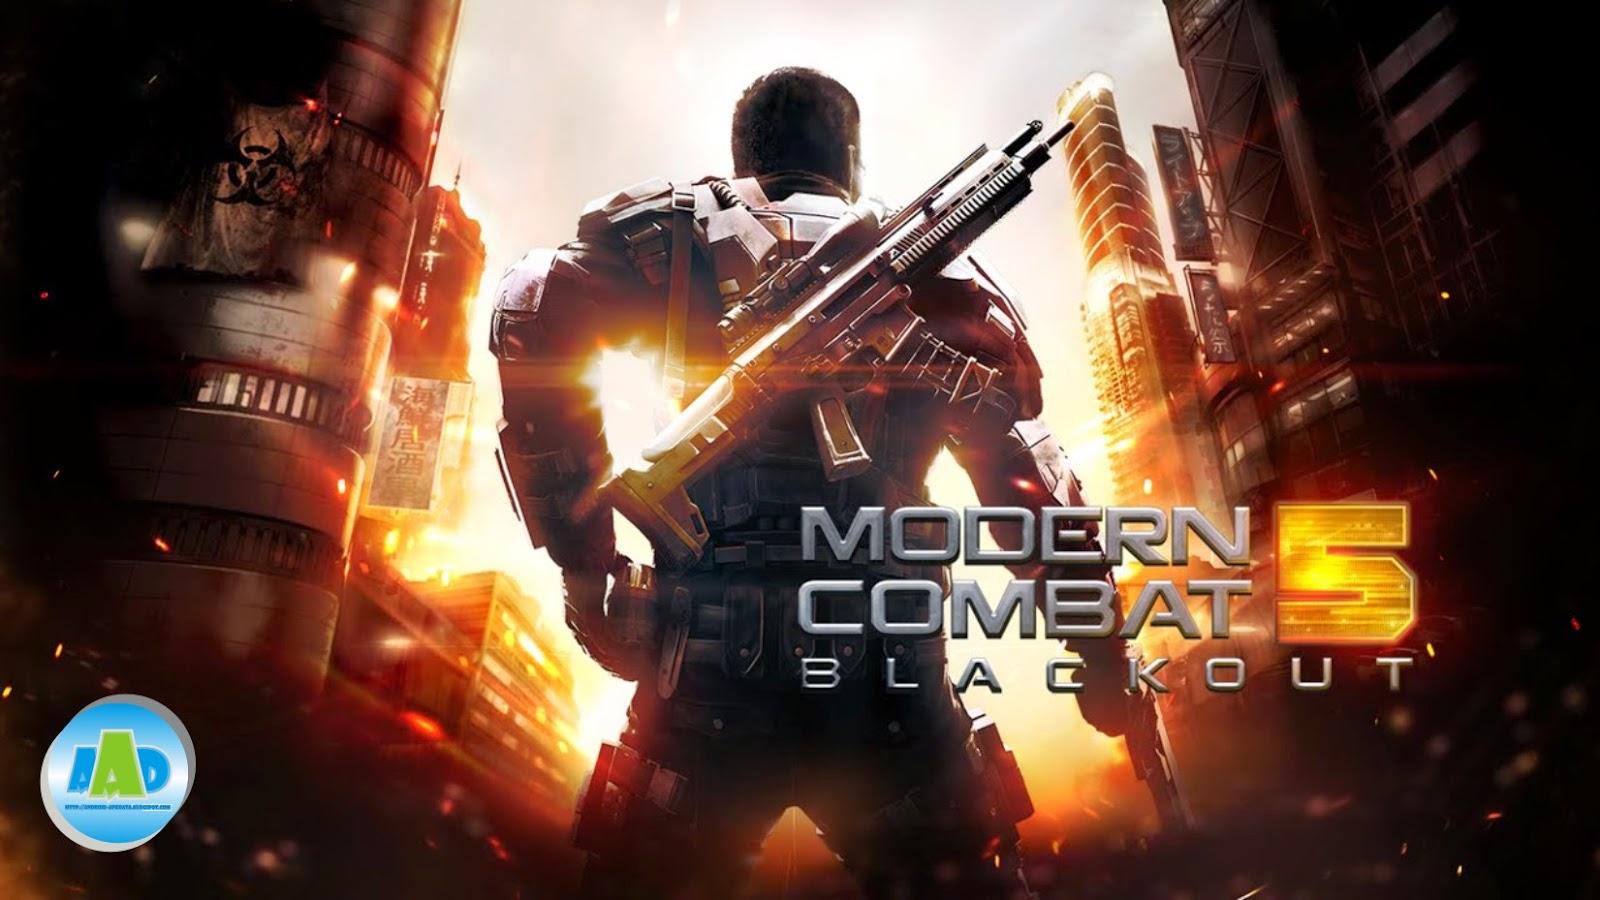 Modern Combat 4 Zero Hour v1.2.2e Apk Mod Data Download For Android